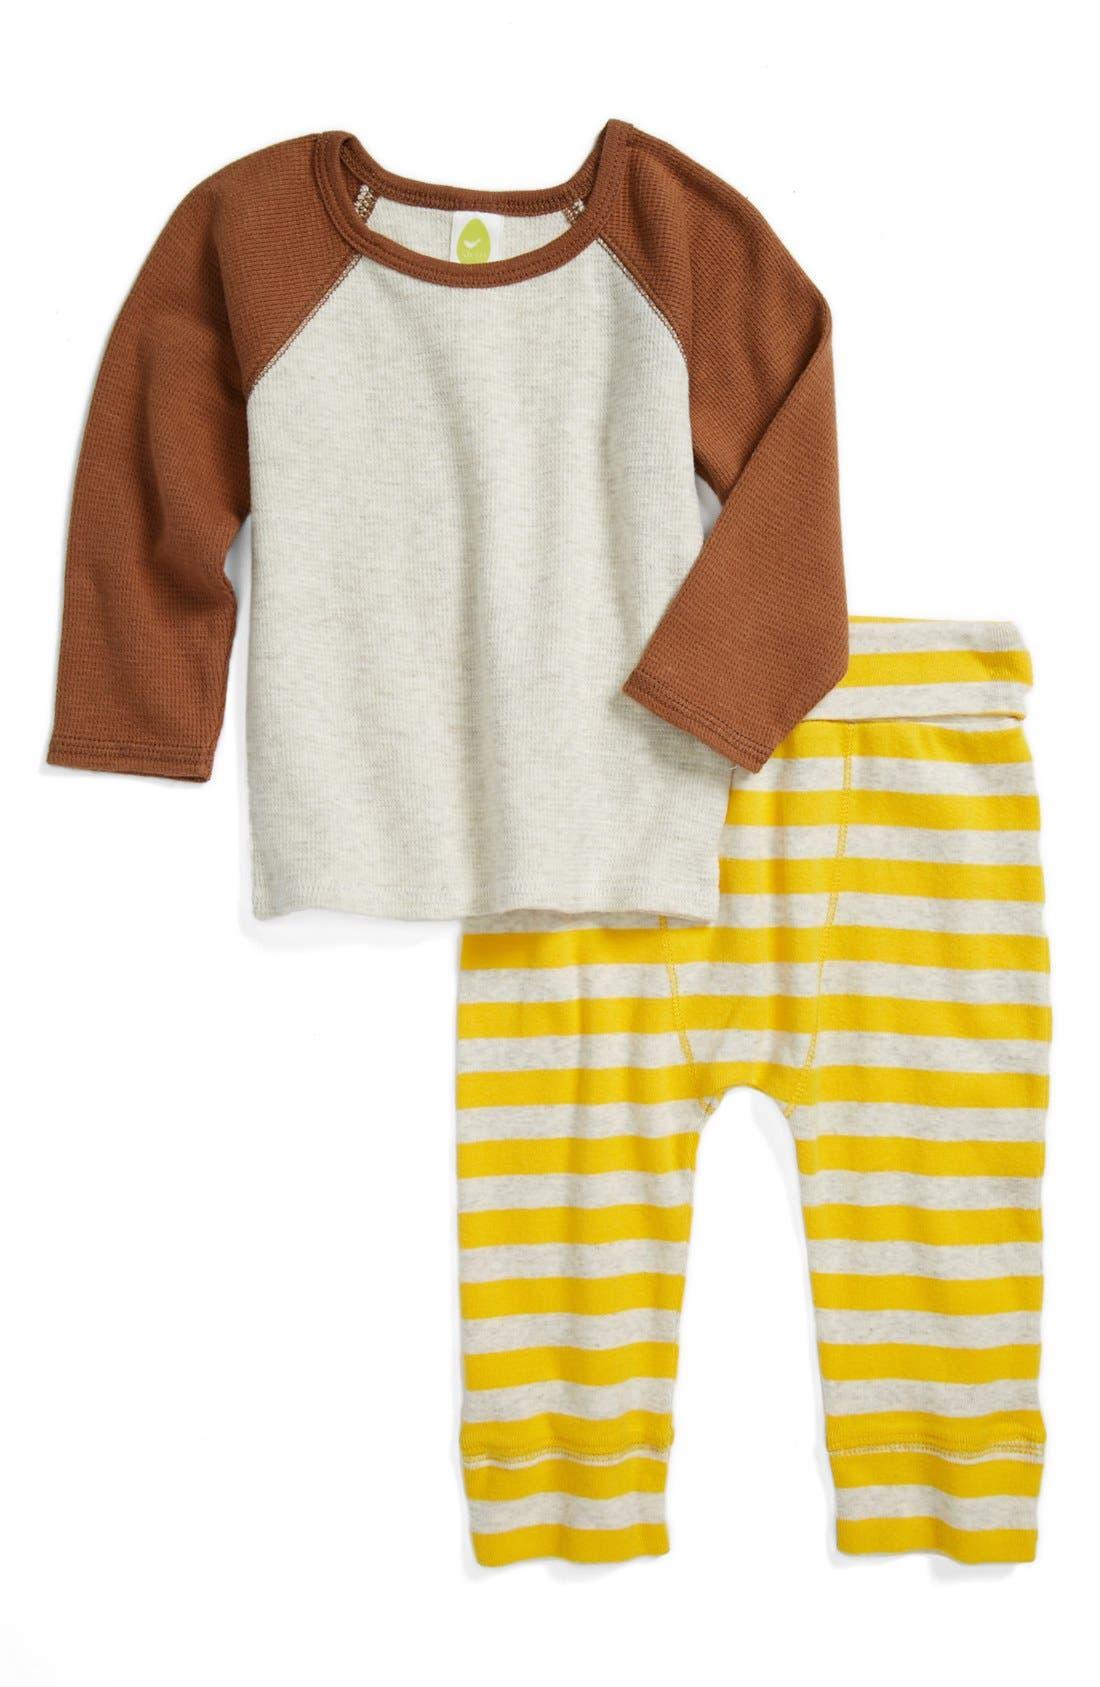 Main Image - Stem Baby Organic Cotton Top & Pants (Baby Boys)